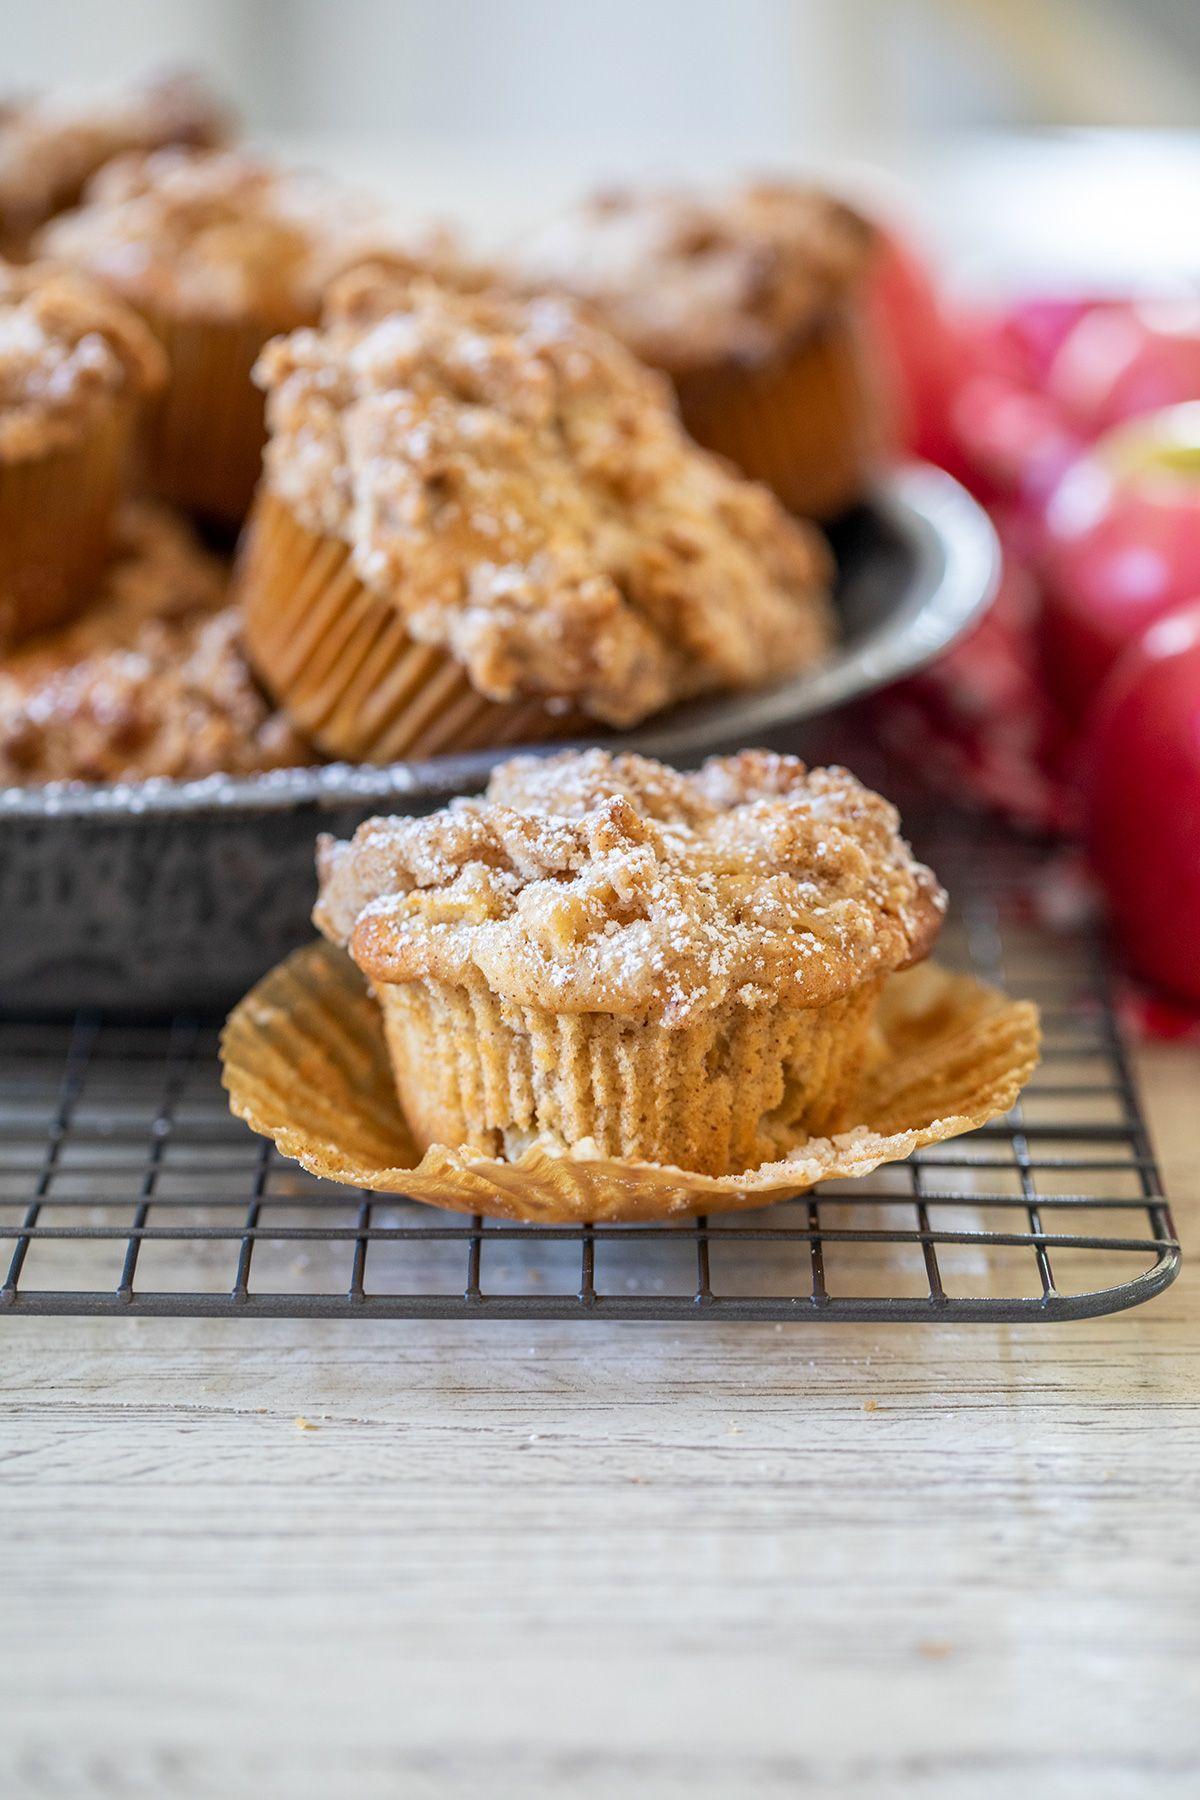 Apple Cinnamon Streusel Muffins In 2020 Cinnamon Streusel Muffins Apple Cinnamon Streusel Muffins Muffin Streusel